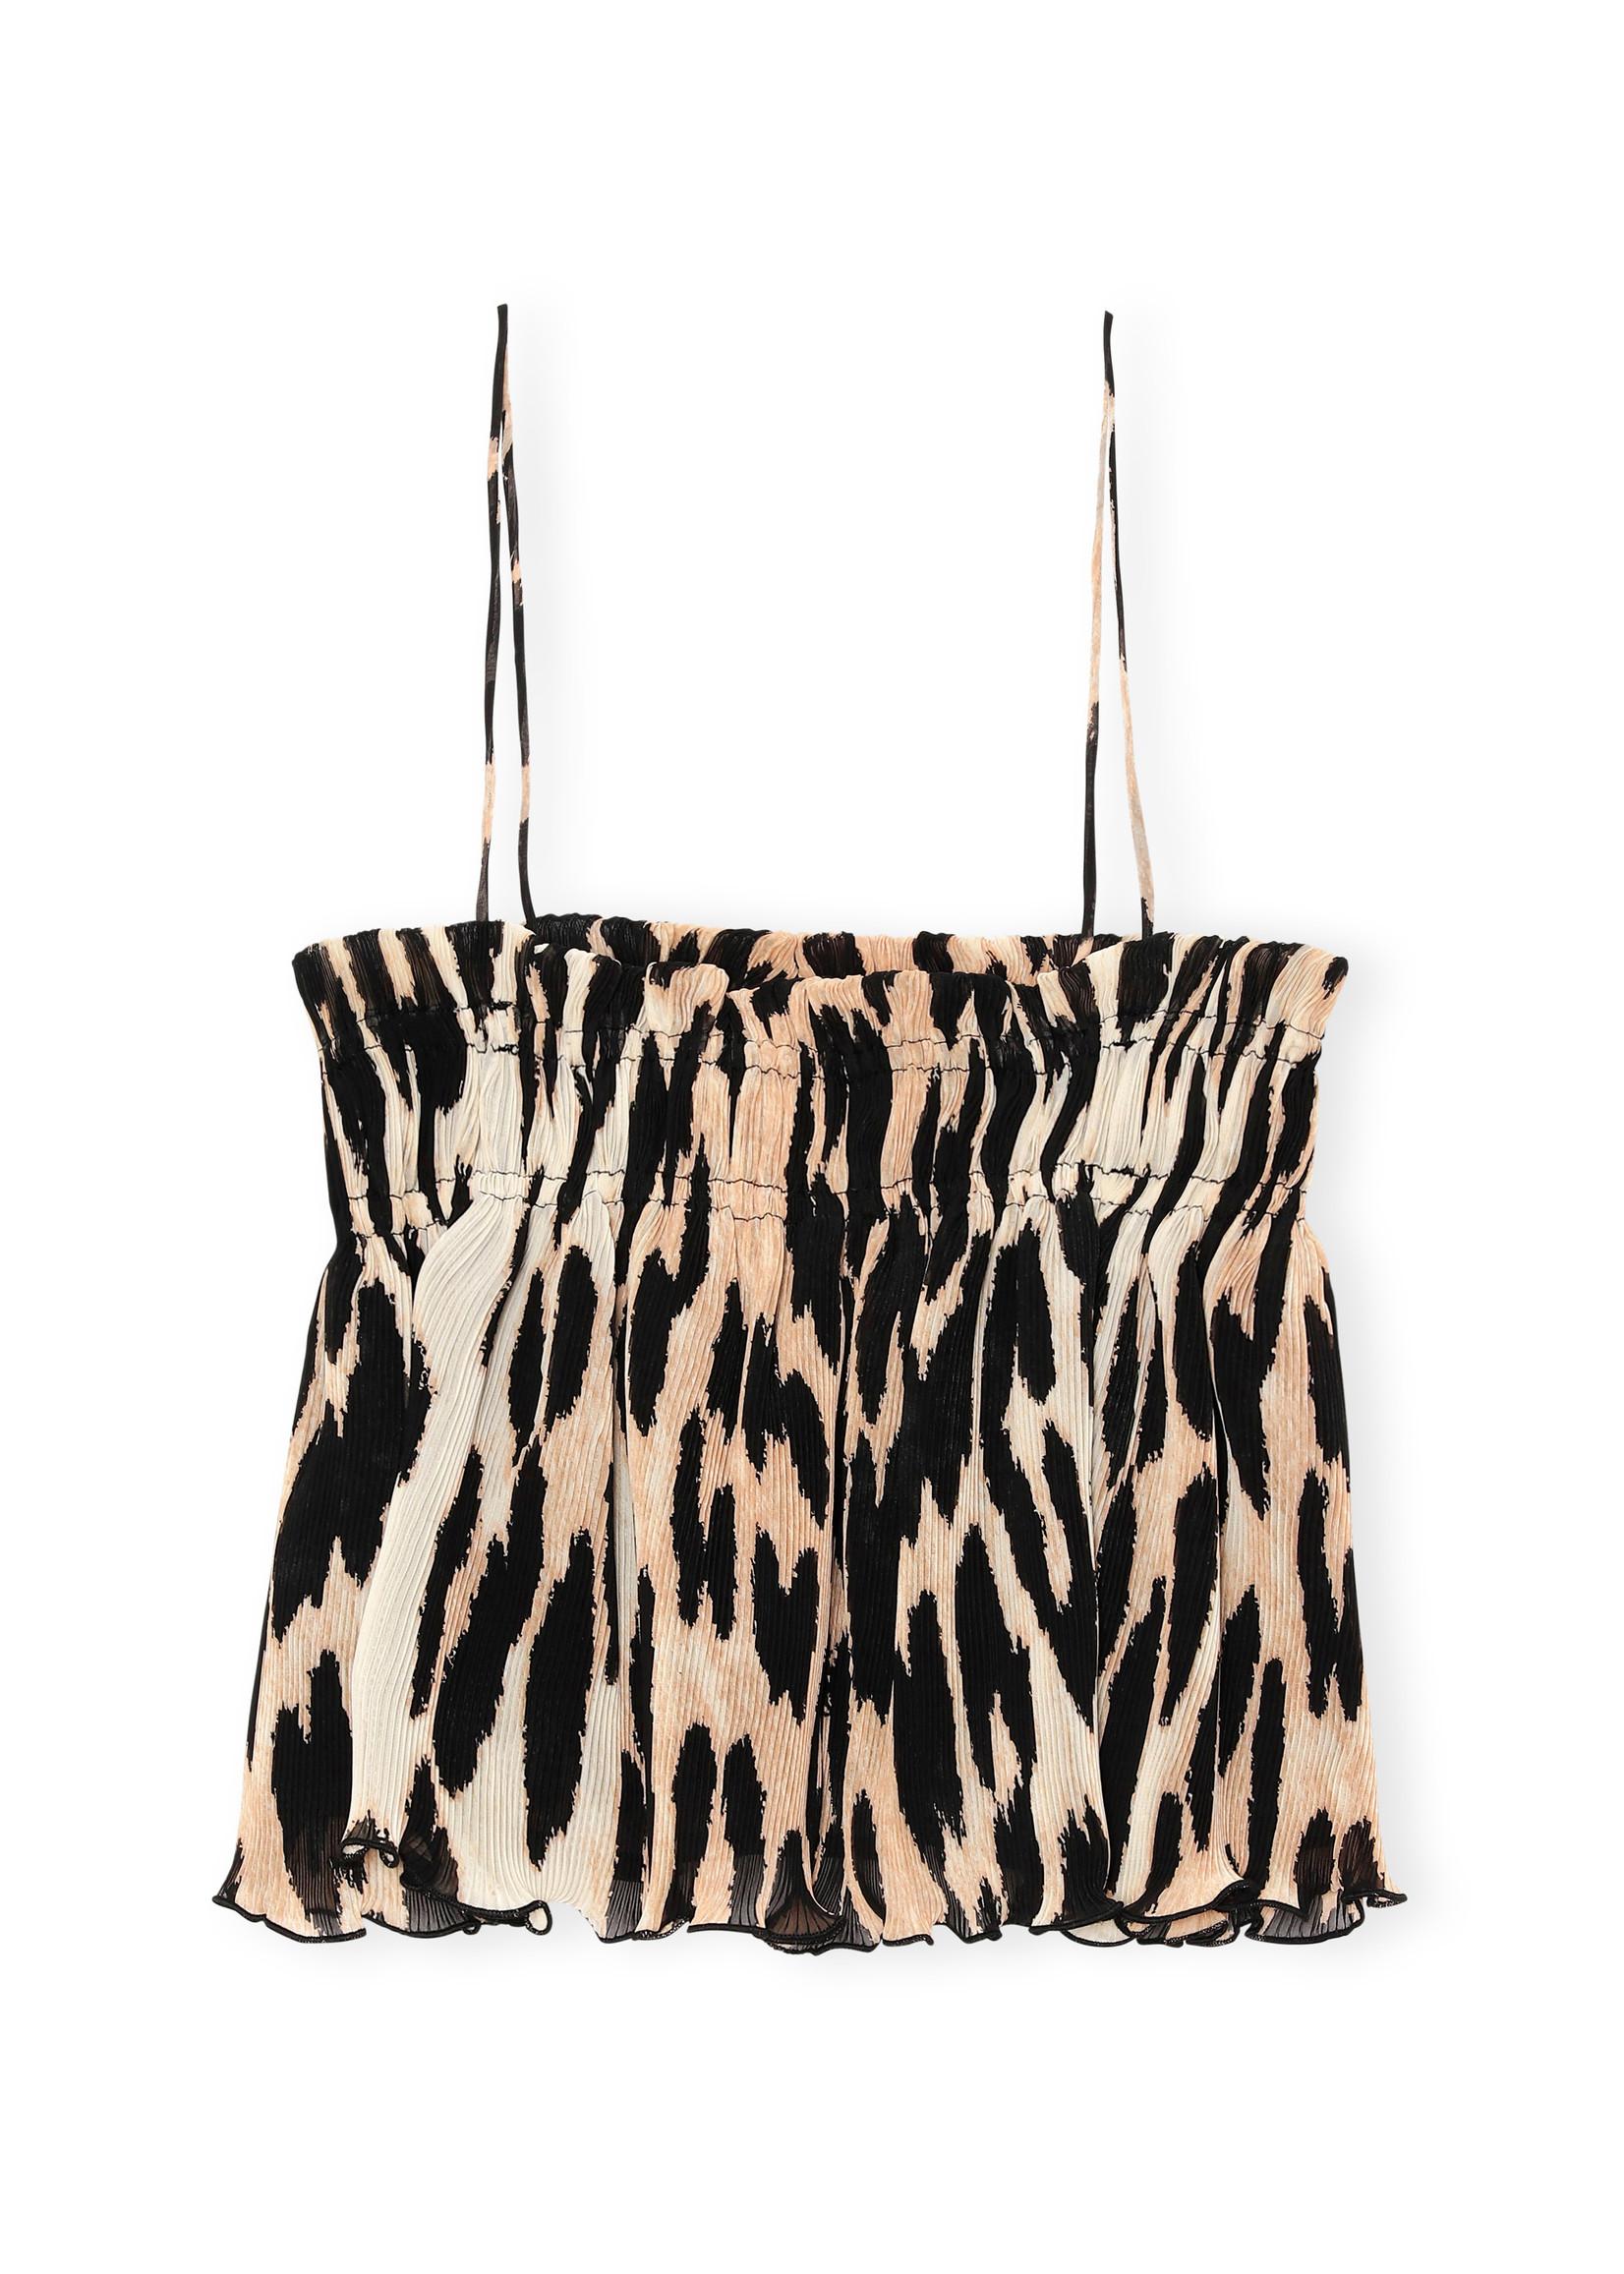 GANNI Pleated Strap Top in Maxi Leopard